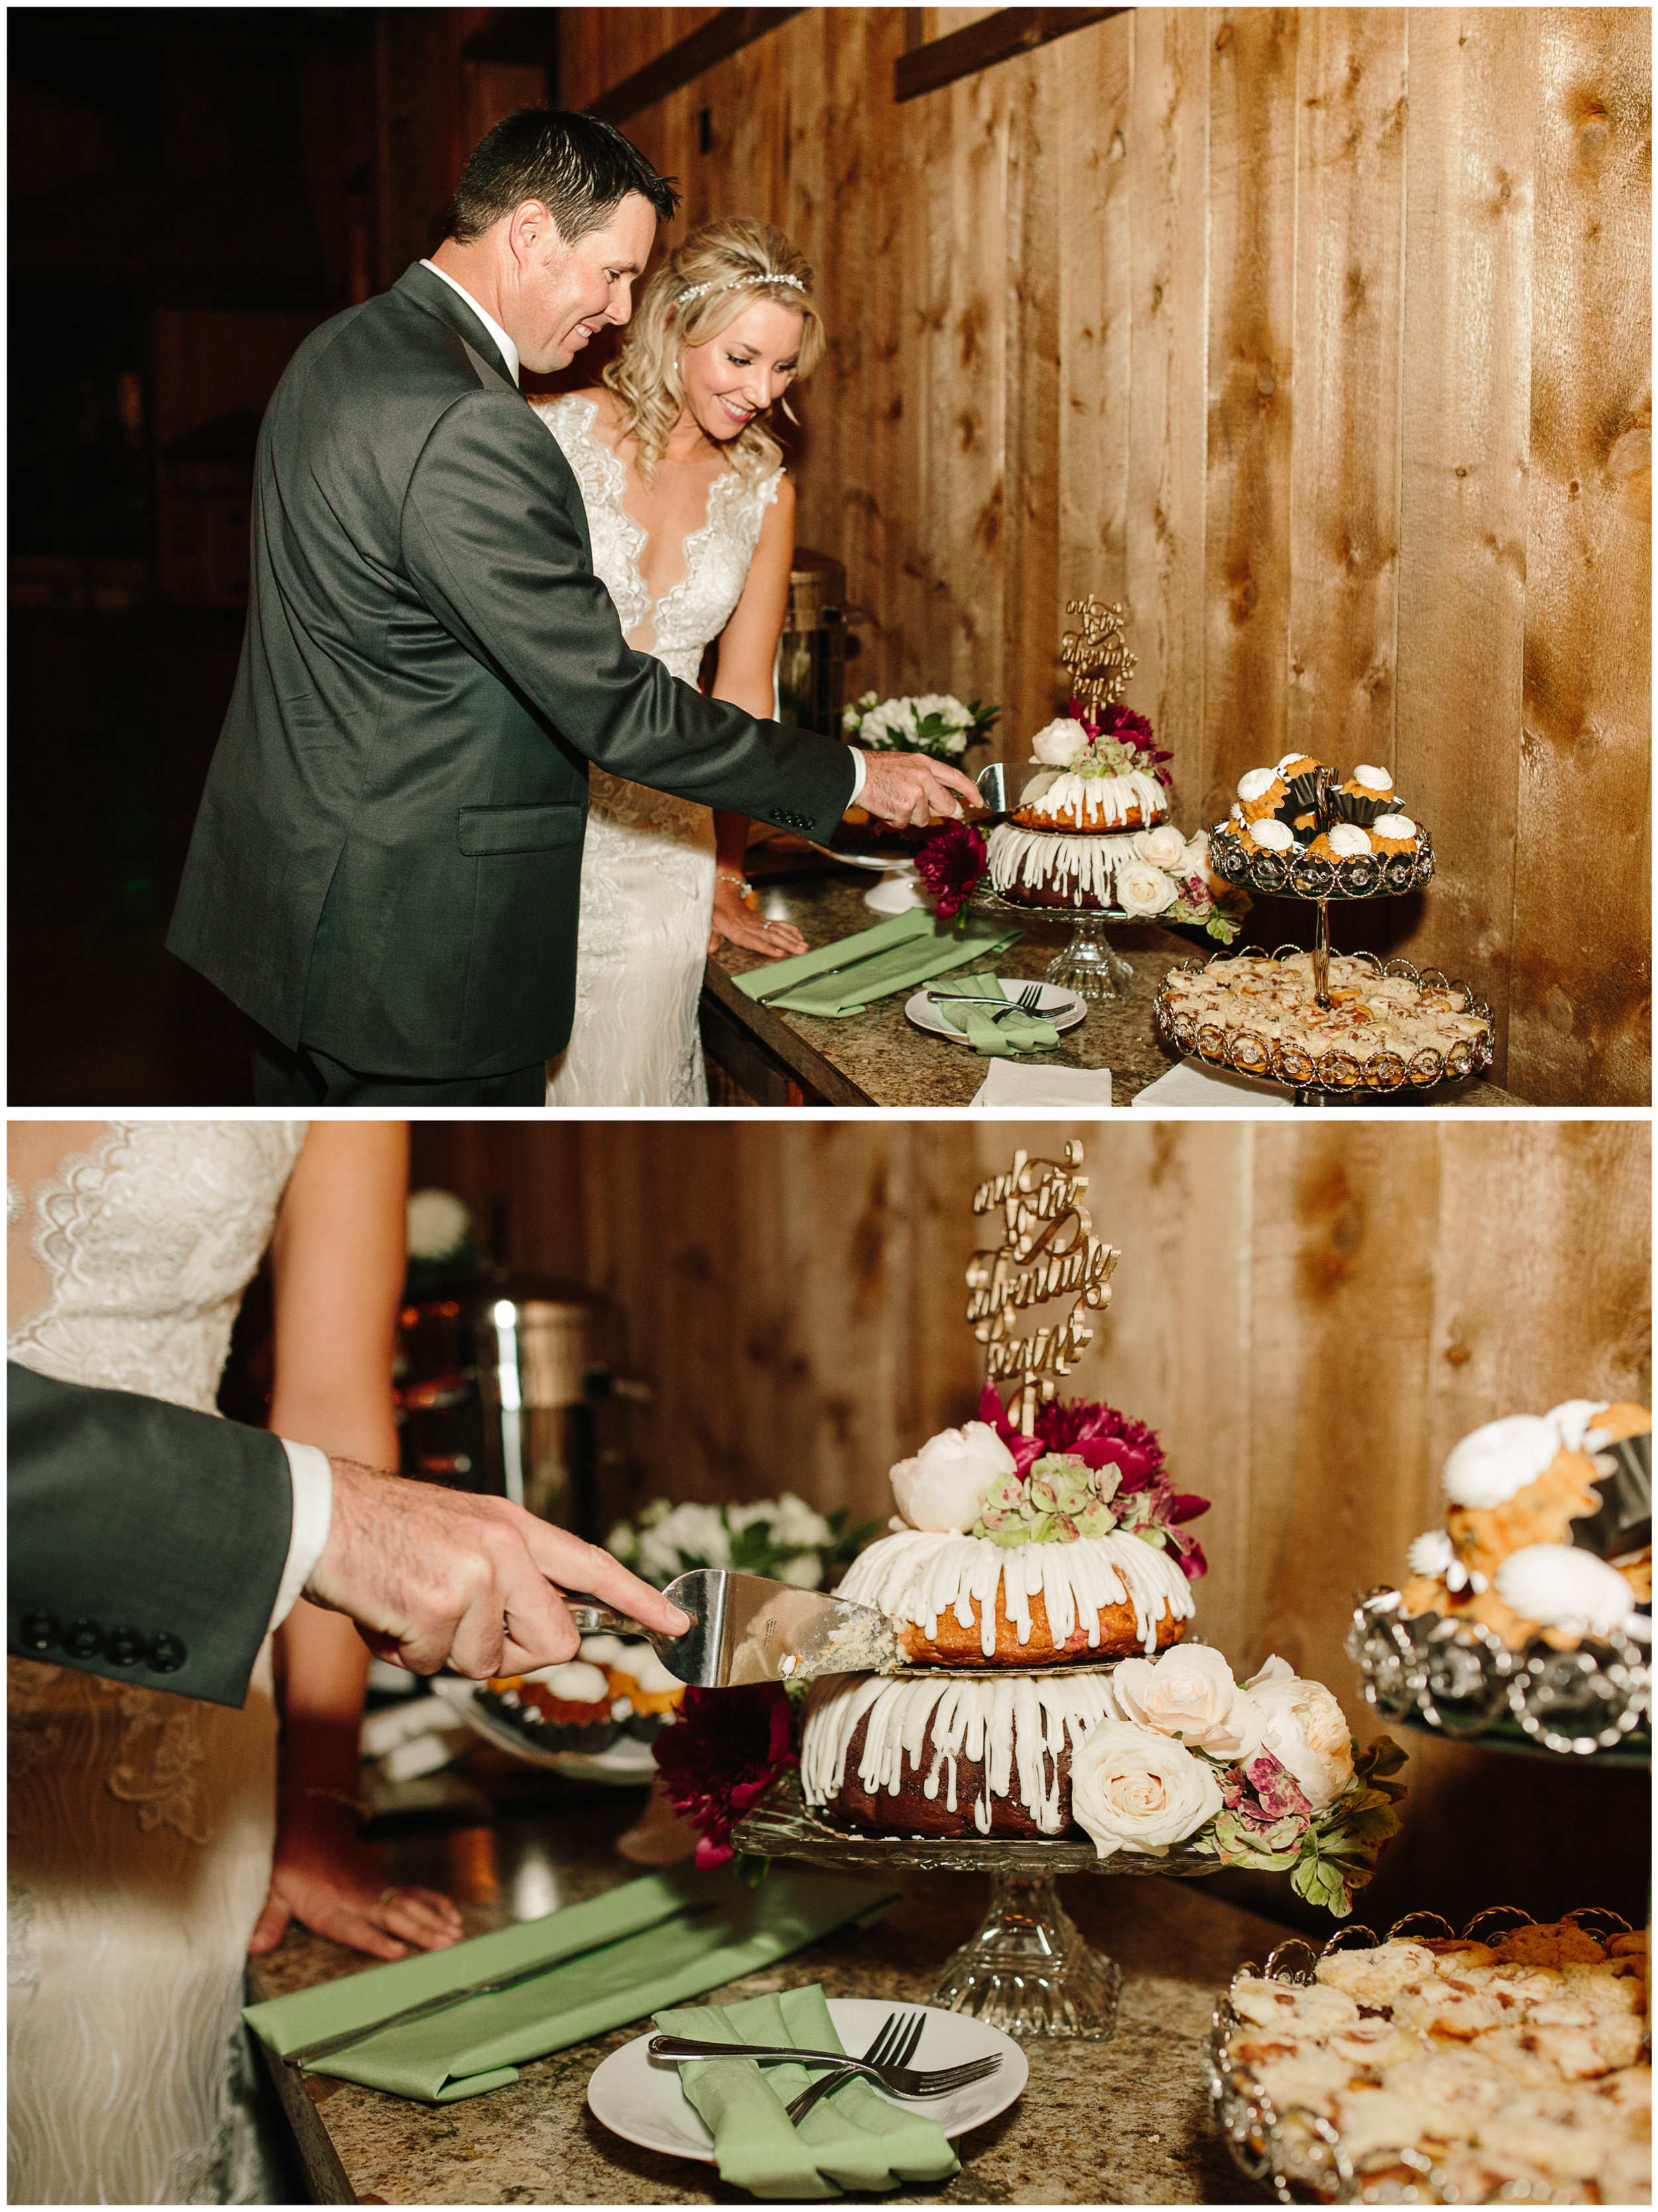 spruce_mountain_ranch_wedding_72.jpg